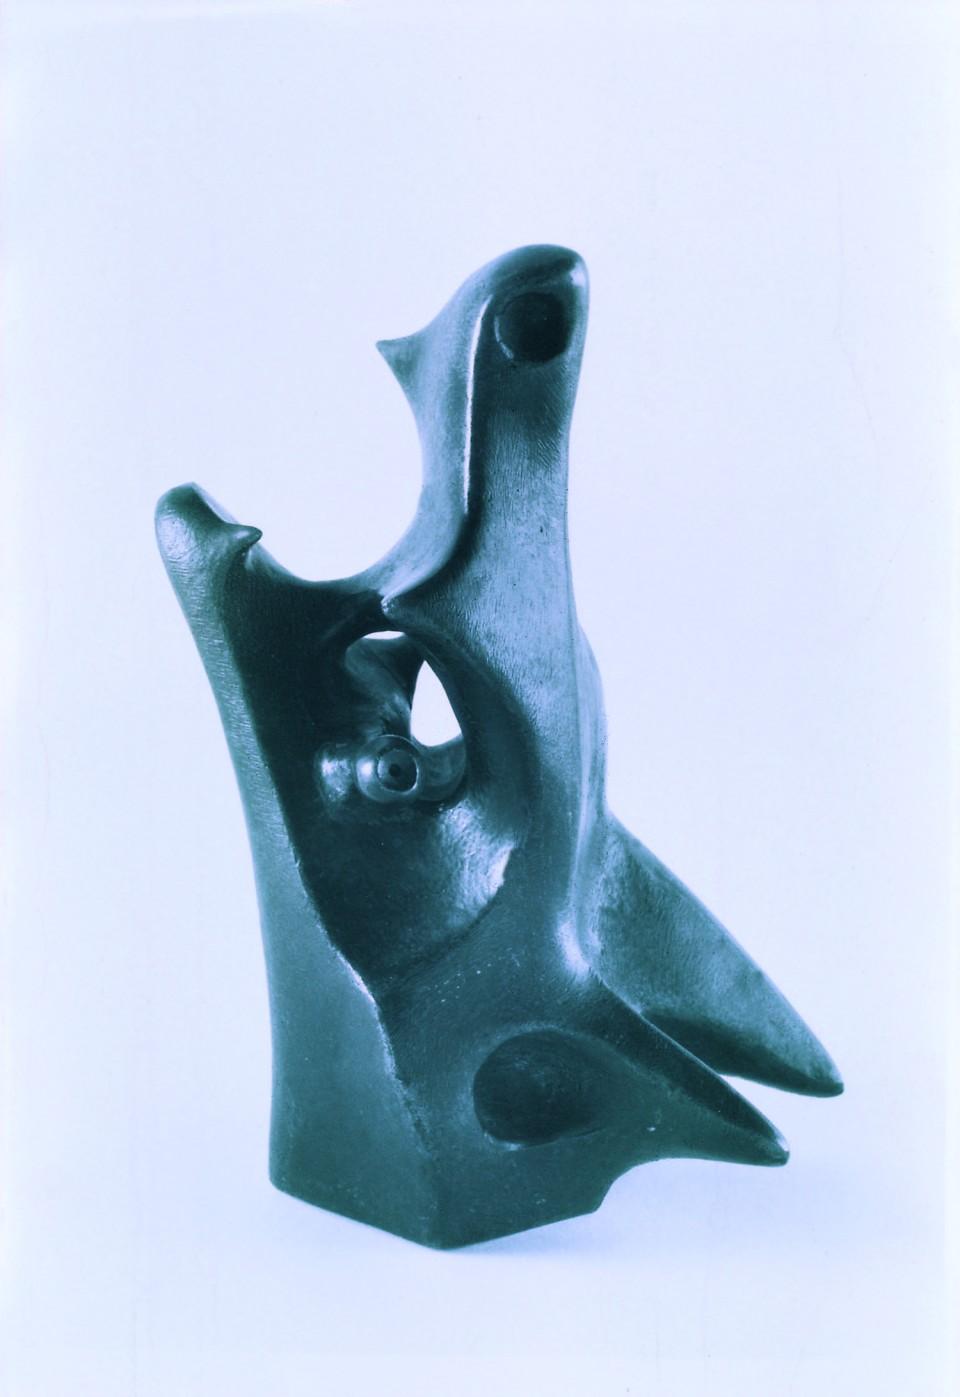 Bronce, 25 cm. Museum of Modern Art, New York